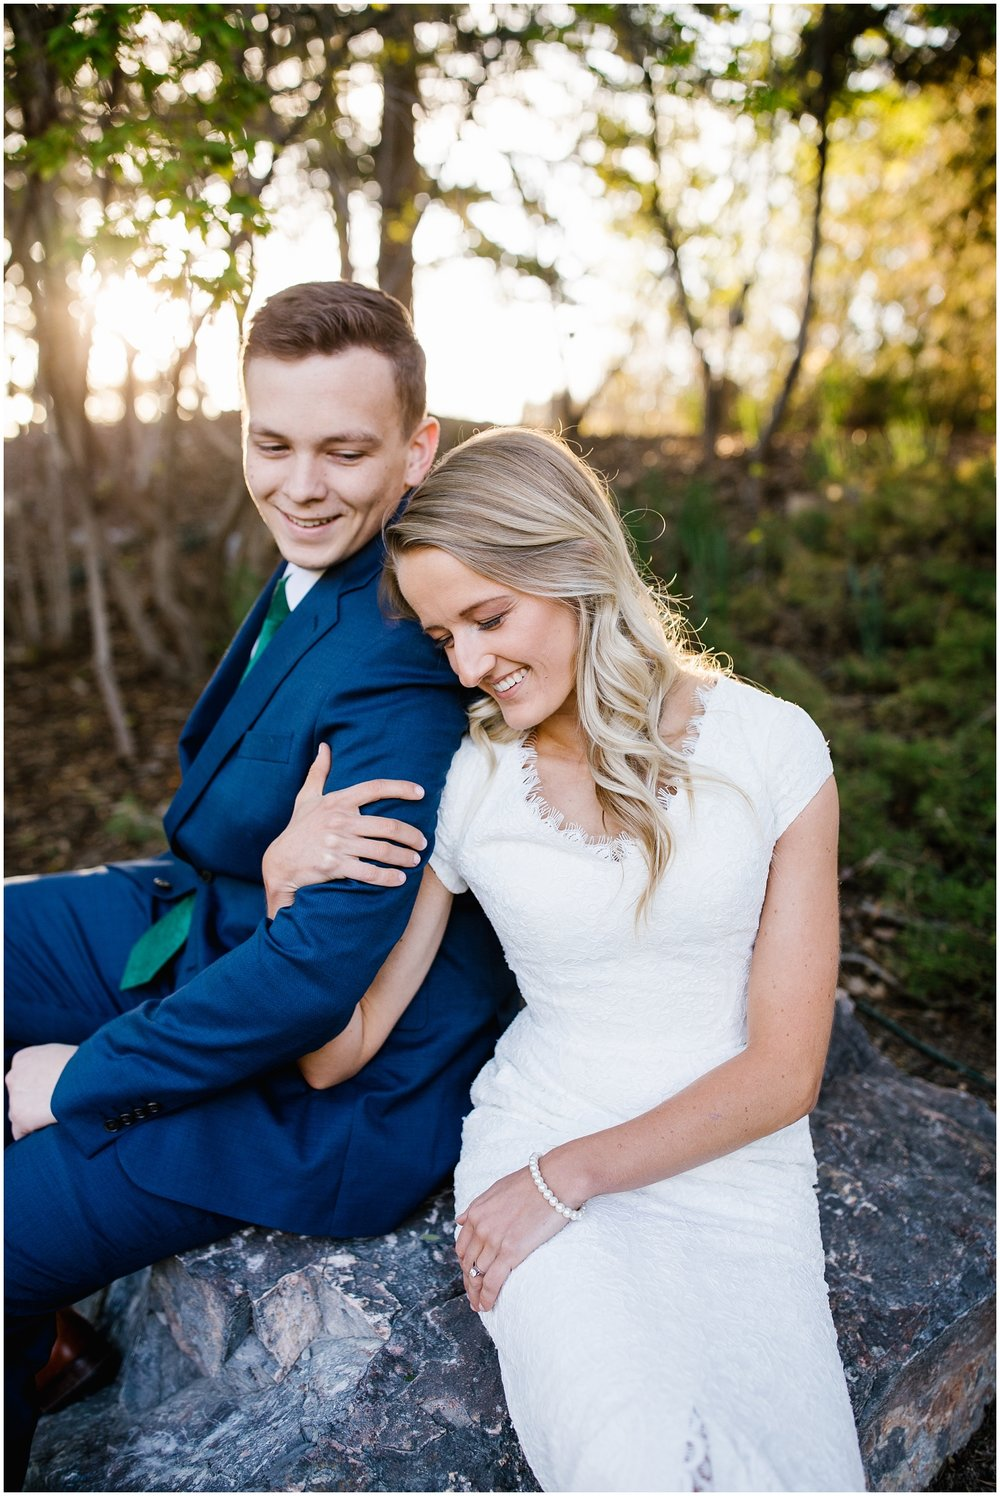 TA-Bridals-46_Lizzie-B-Imagery-Utah-Wedding-Photographer-Park-City-Salt-Lake-City-Thanksgiving-Point-Ashton-Gardens-Lehi-Utah.jpg